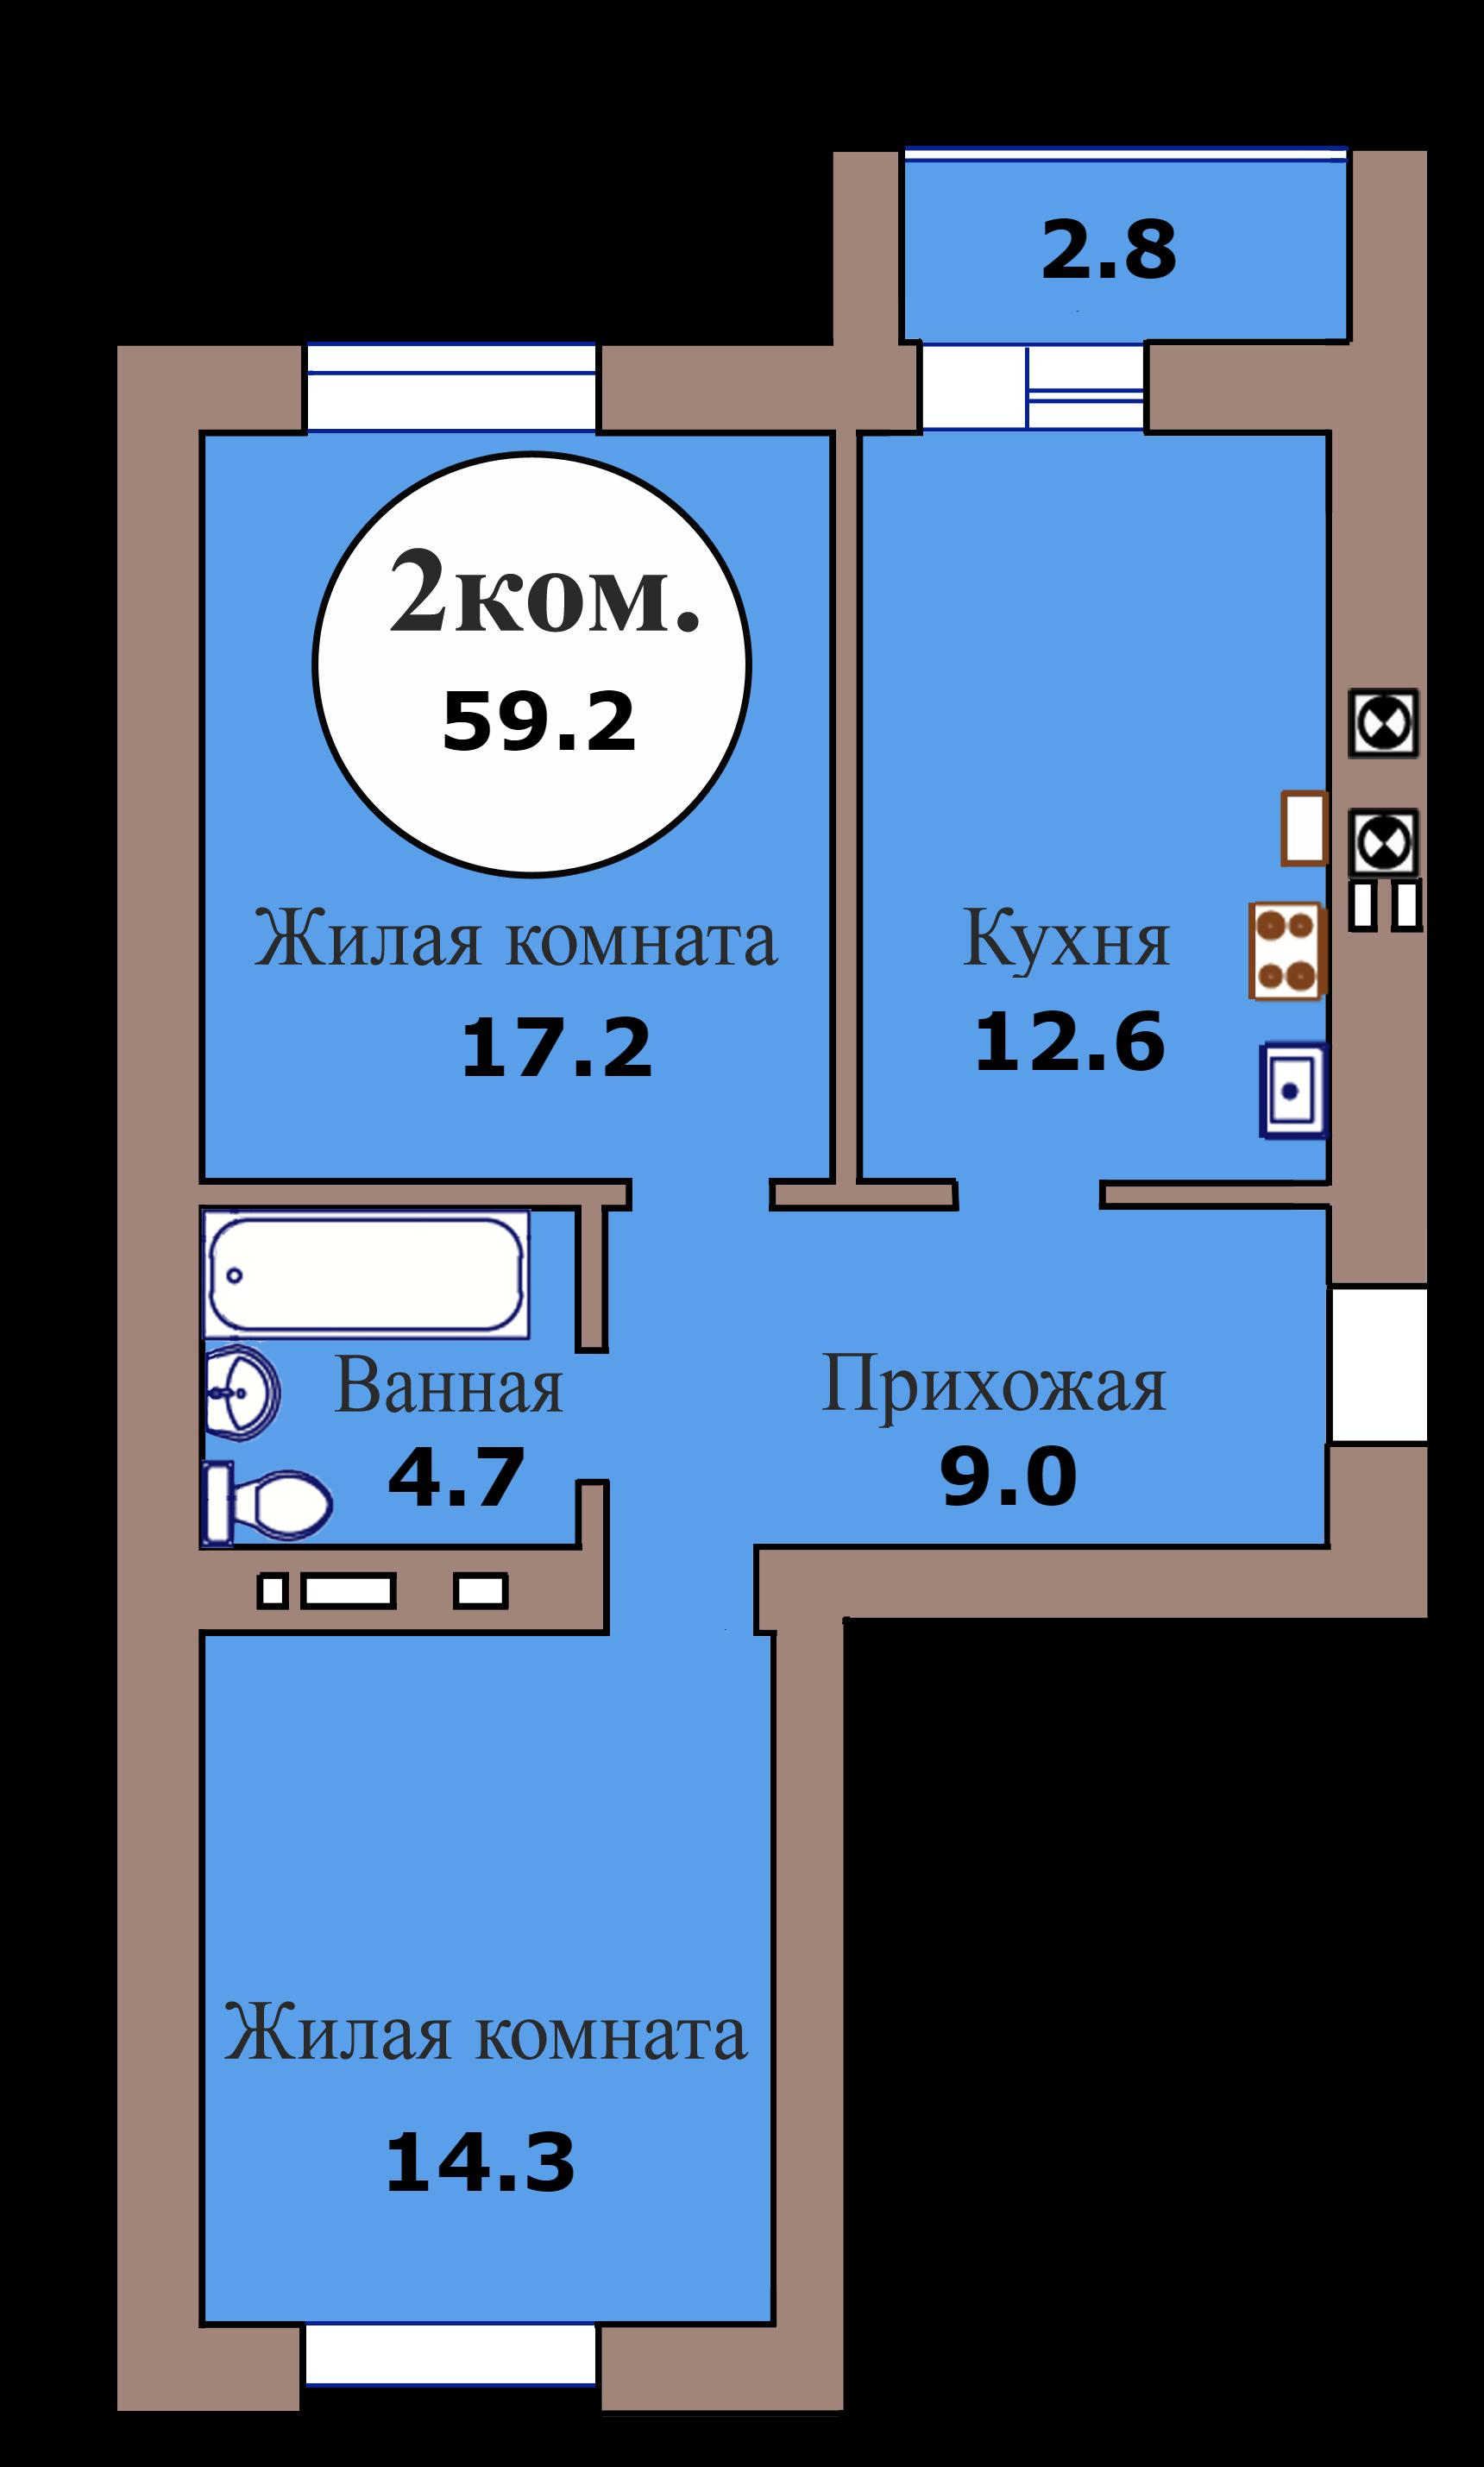 2-комн. кв. по ГП дом №3, МКР Васильково, кв. 127 в Калининграде